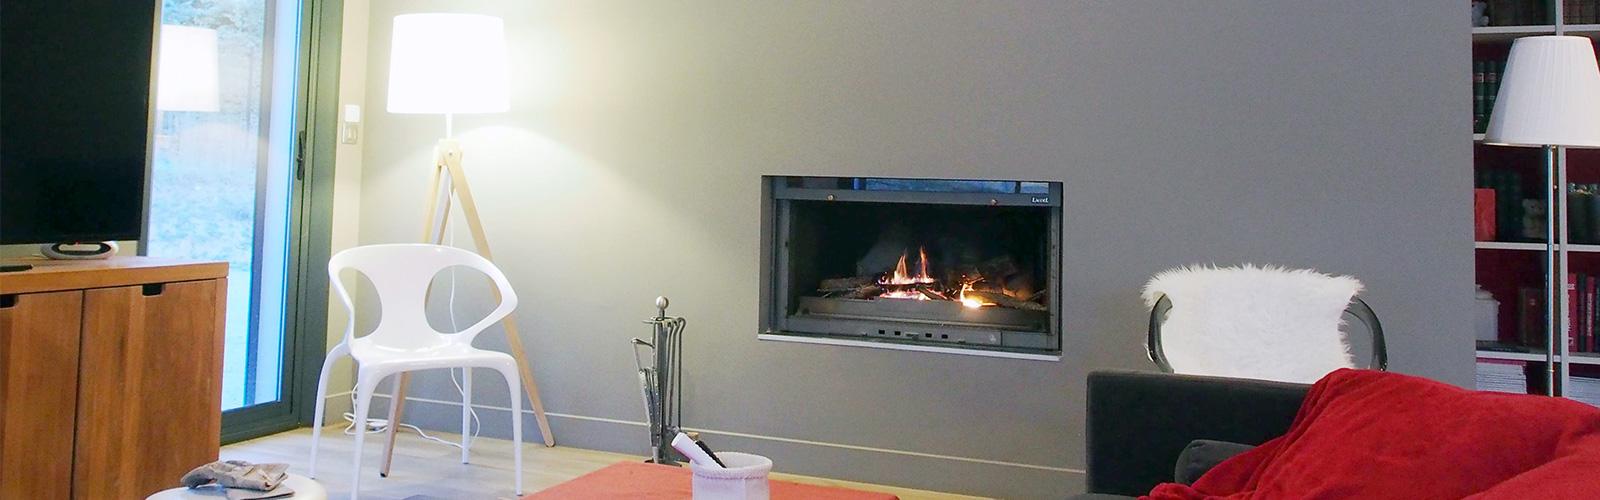 les po les bois de marques invicta lorflam supra turbofonte. Black Bedroom Furniture Sets. Home Design Ideas